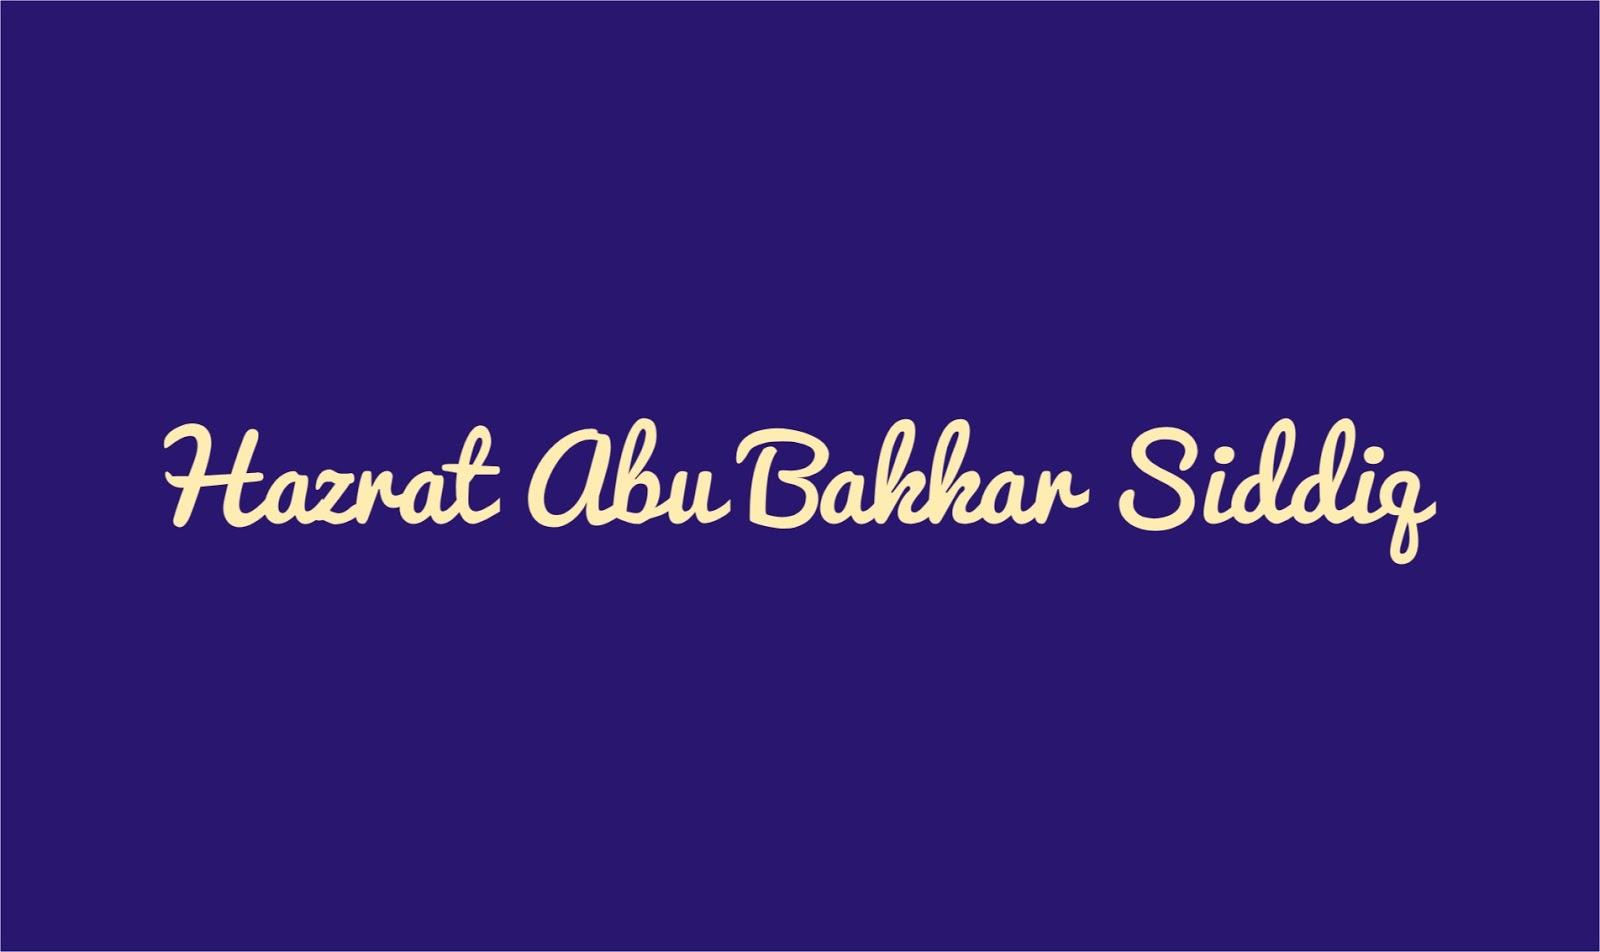 Hazrat Abu Bakkar Siddiq